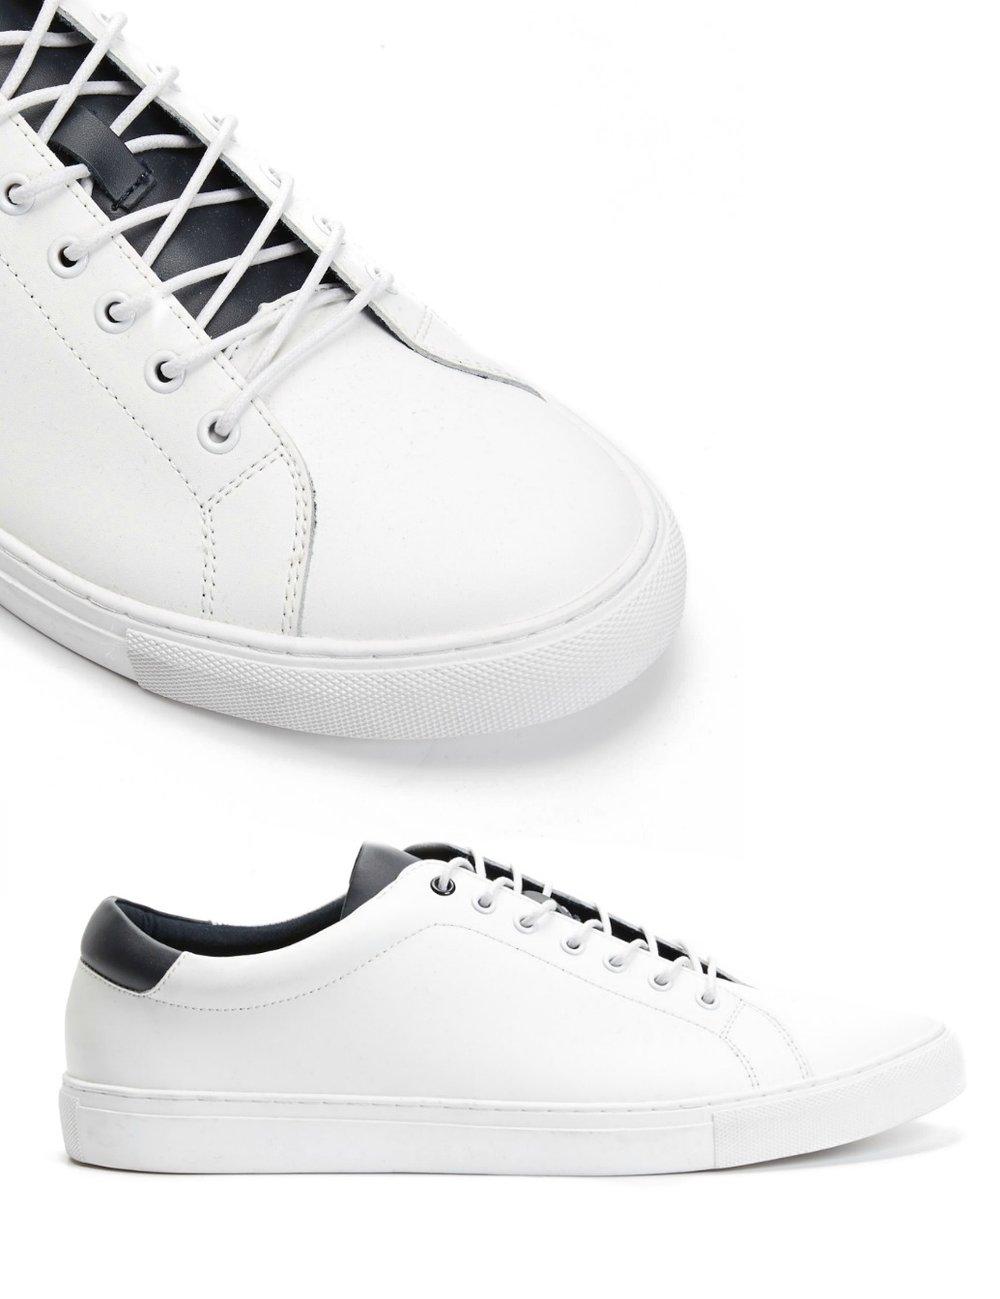 SABASamuel sneaker - SABA.COM.AU